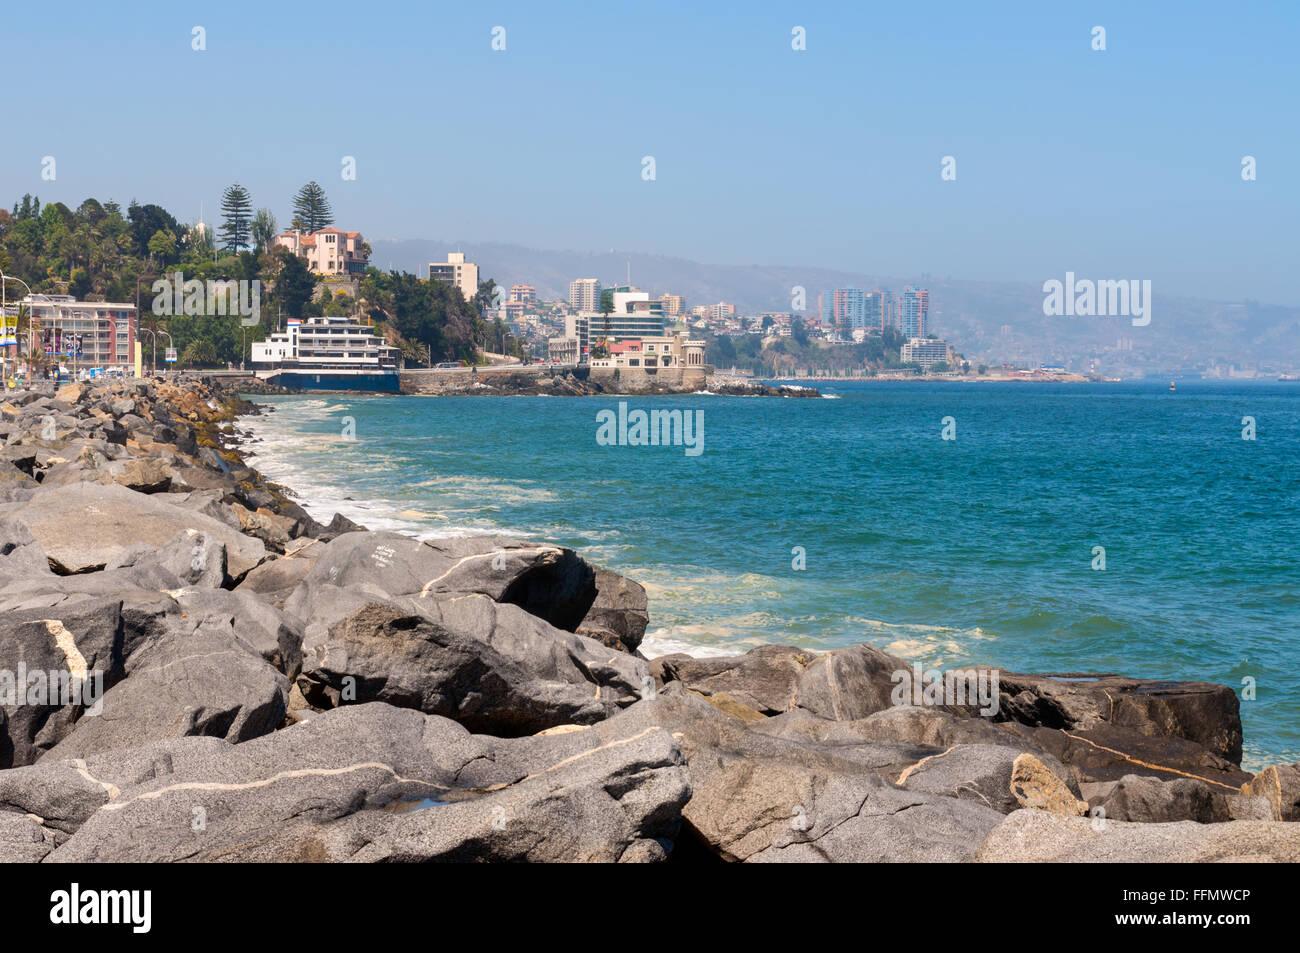 View on the Pacific Ocean coastline of Vina del Mar, Valparaiso Region in Chile. Stock Photo